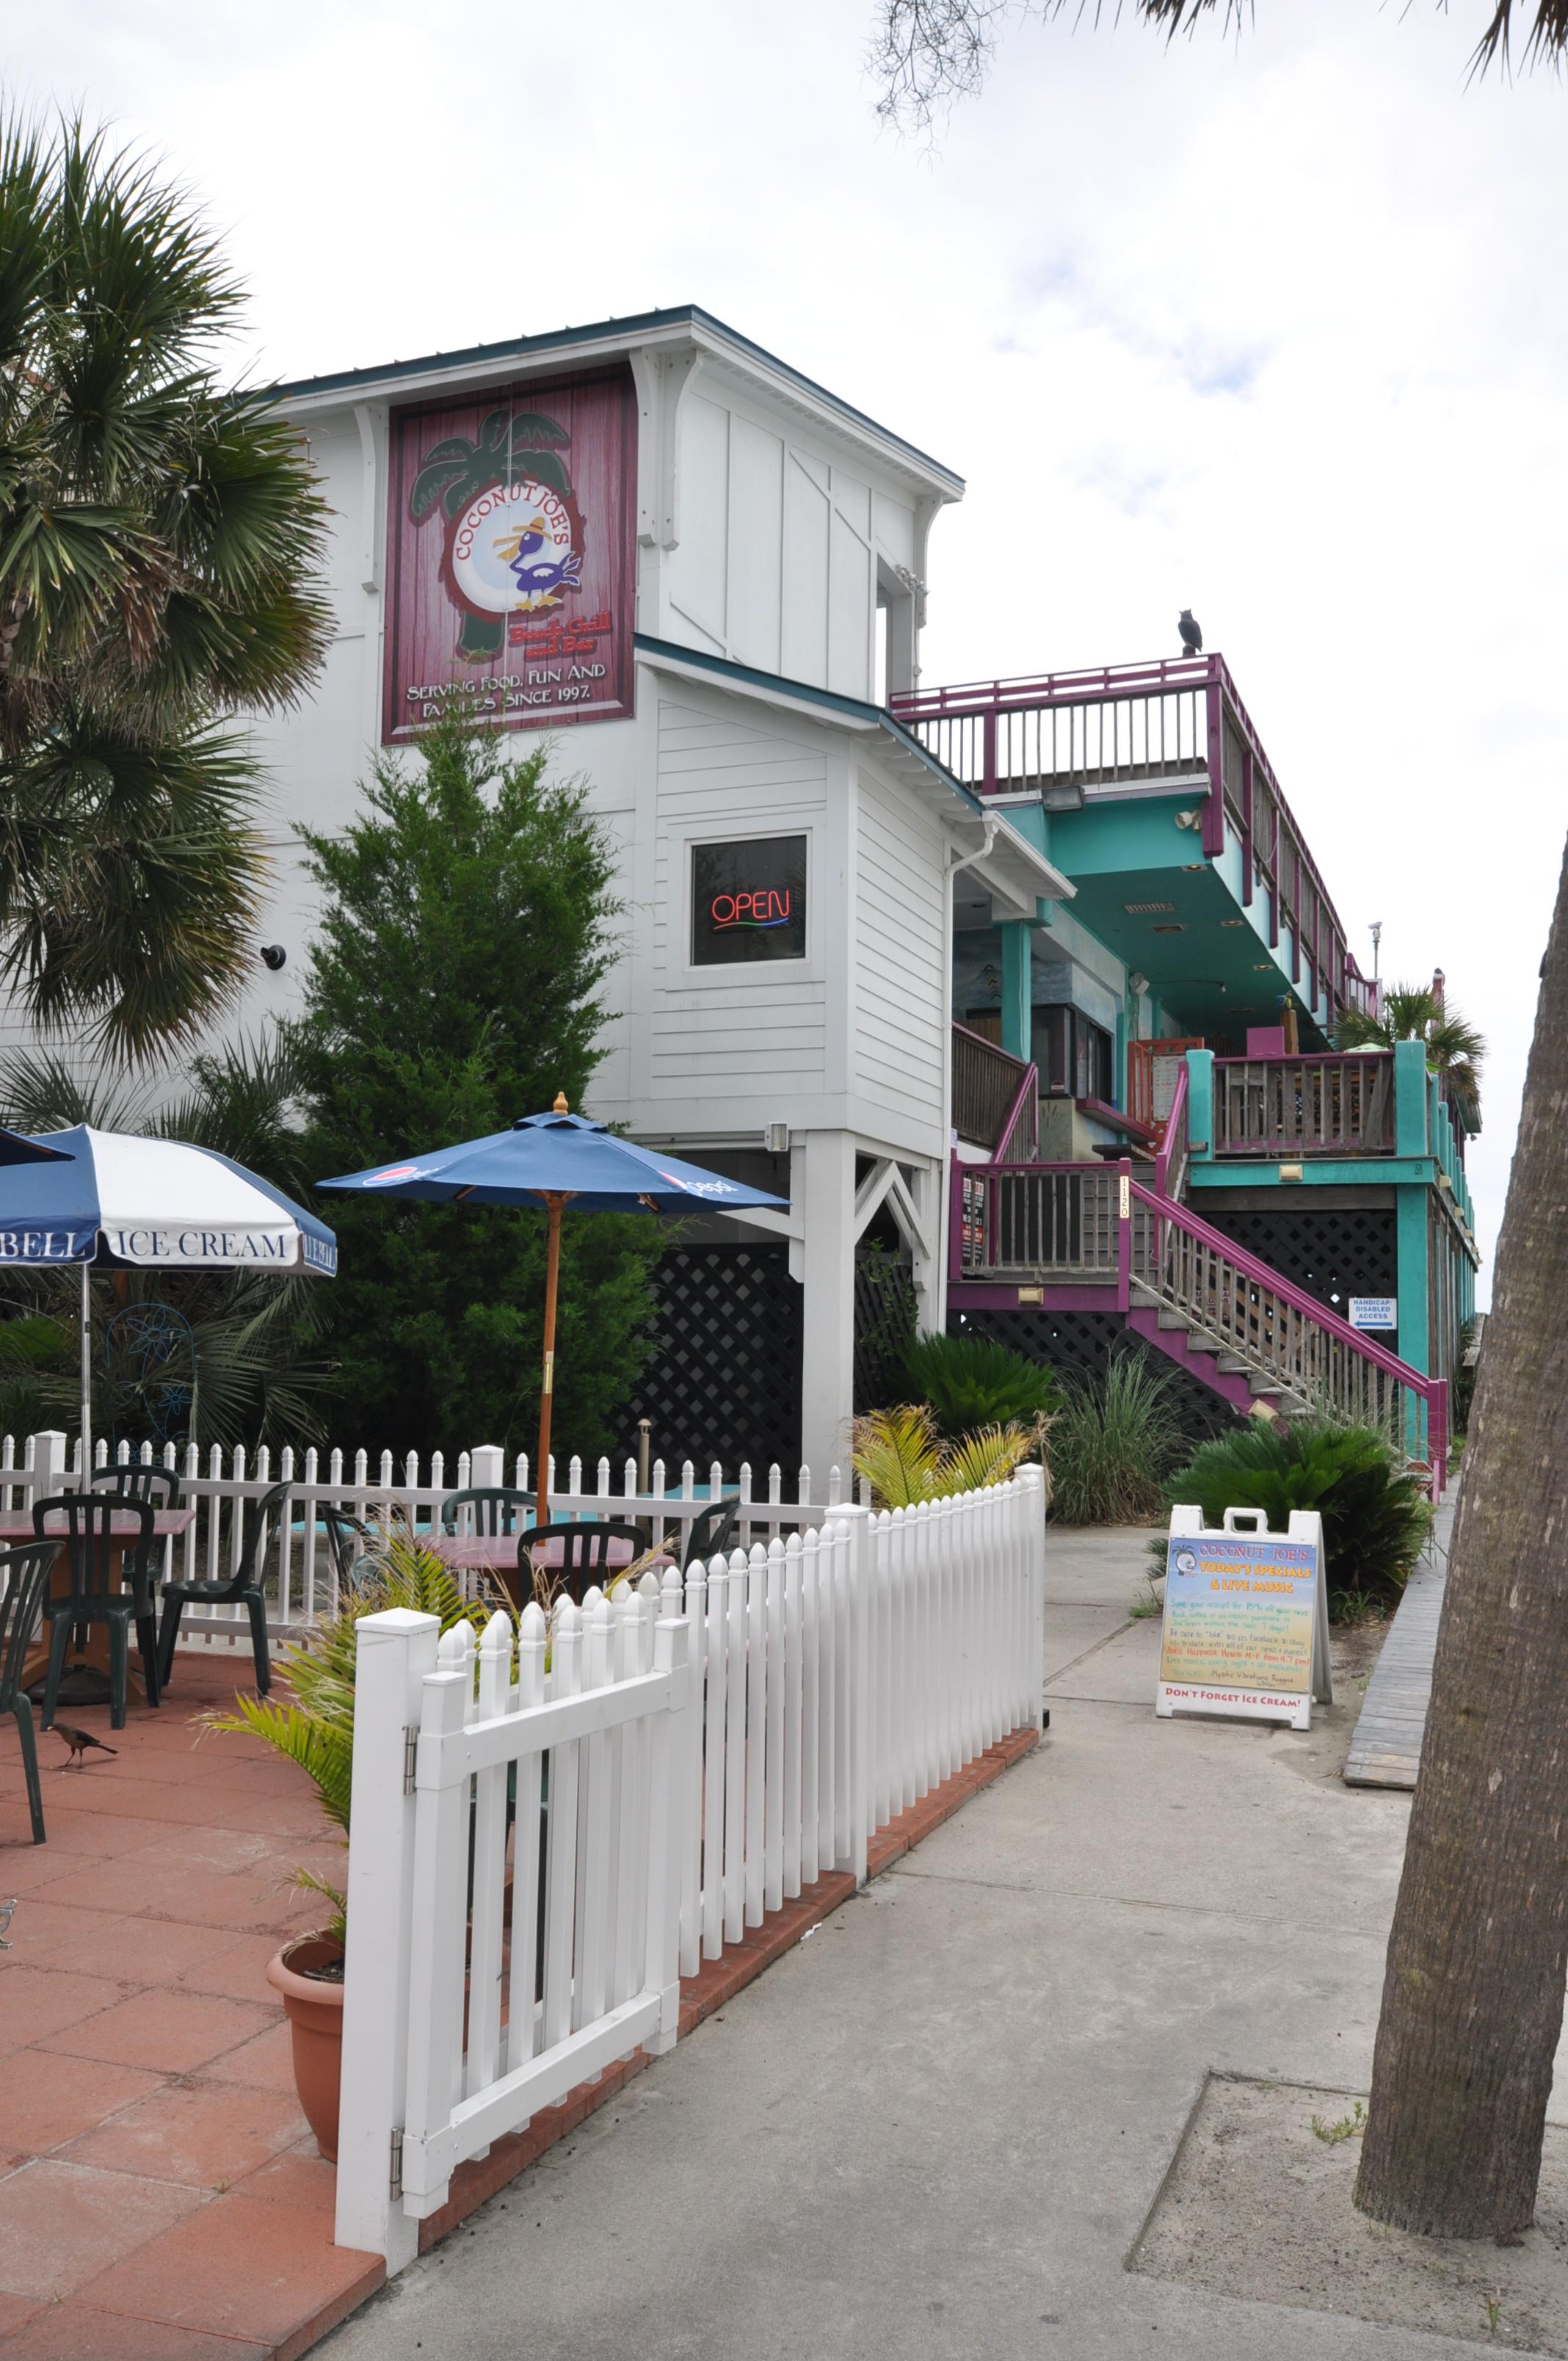 beach chair rental isle of palms wheelchair rack real estate for sale